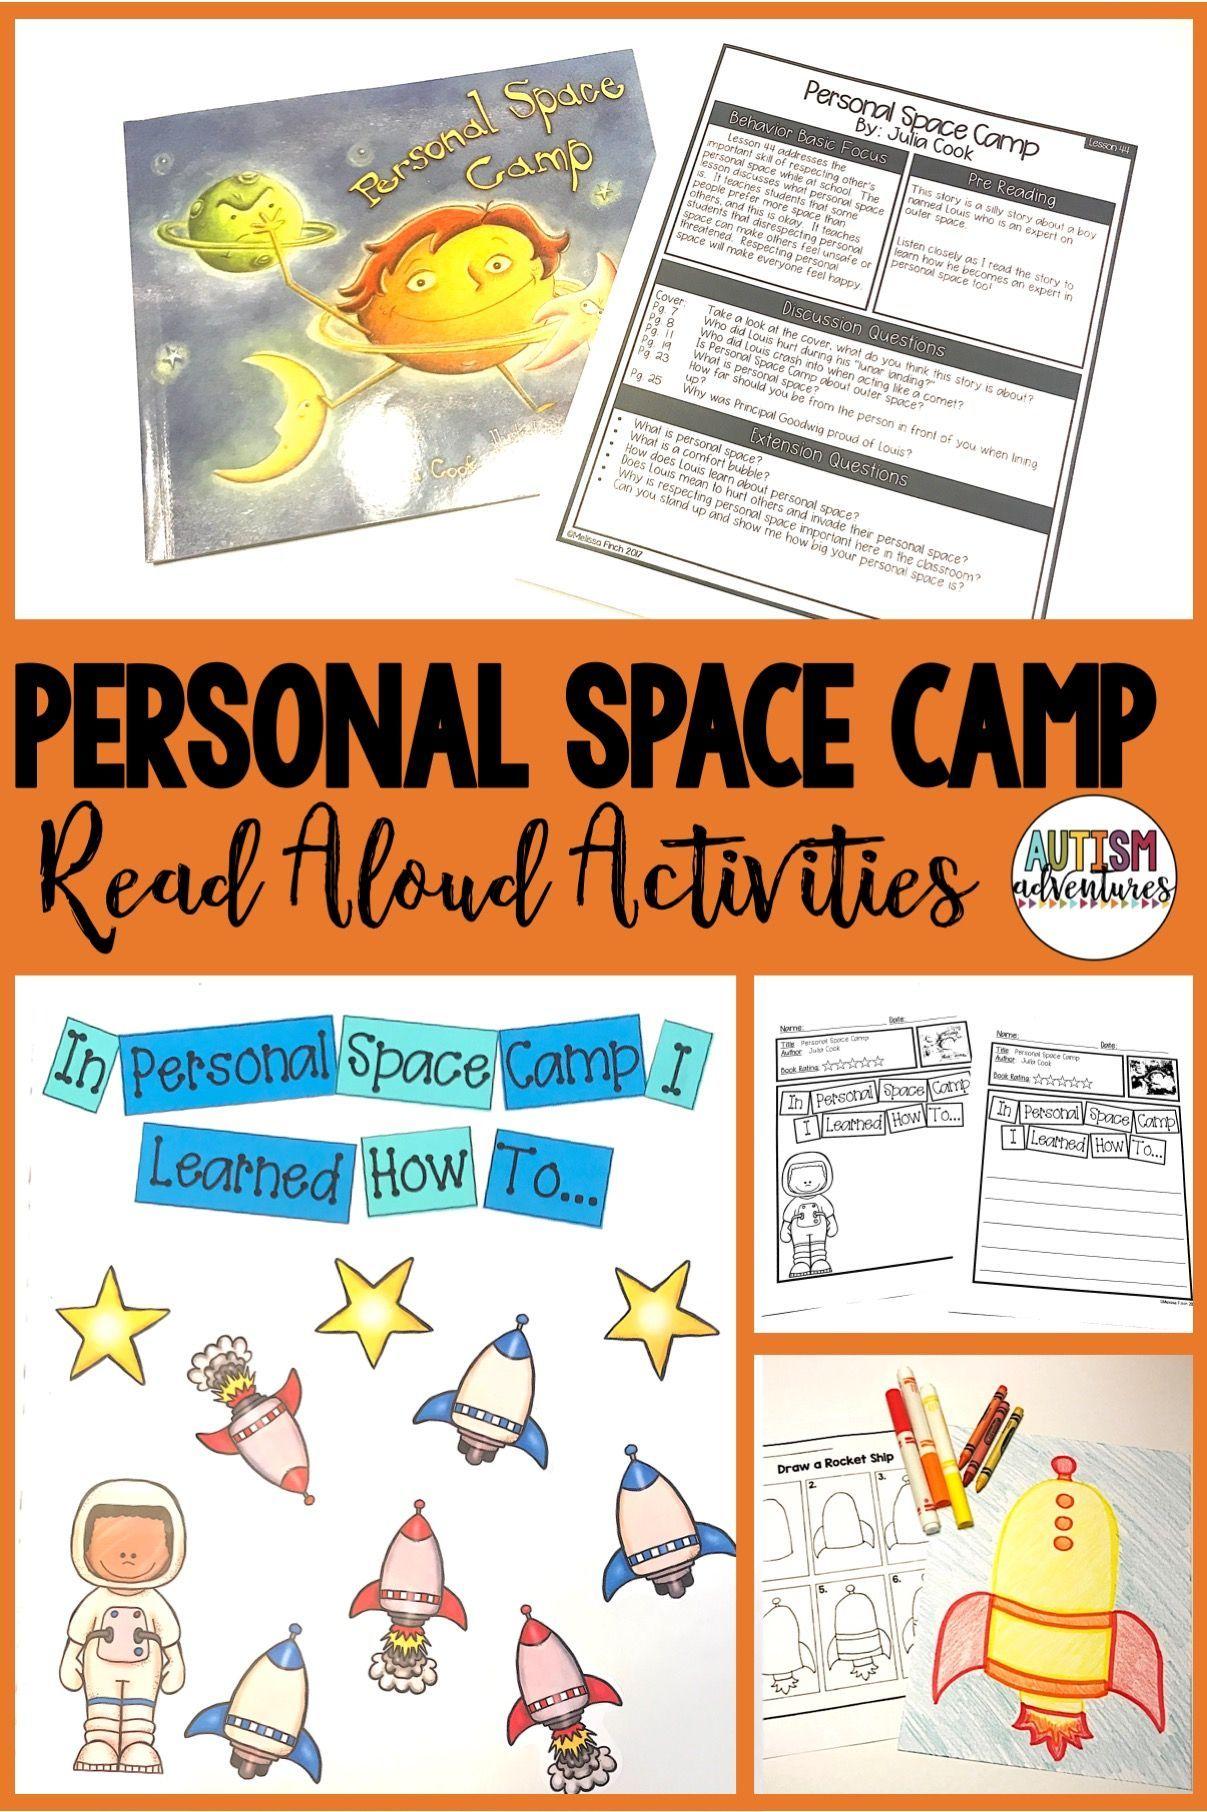 Personal Space Camp Behavior Basics Book Club Space Camp Space Camp Activities Personal Space